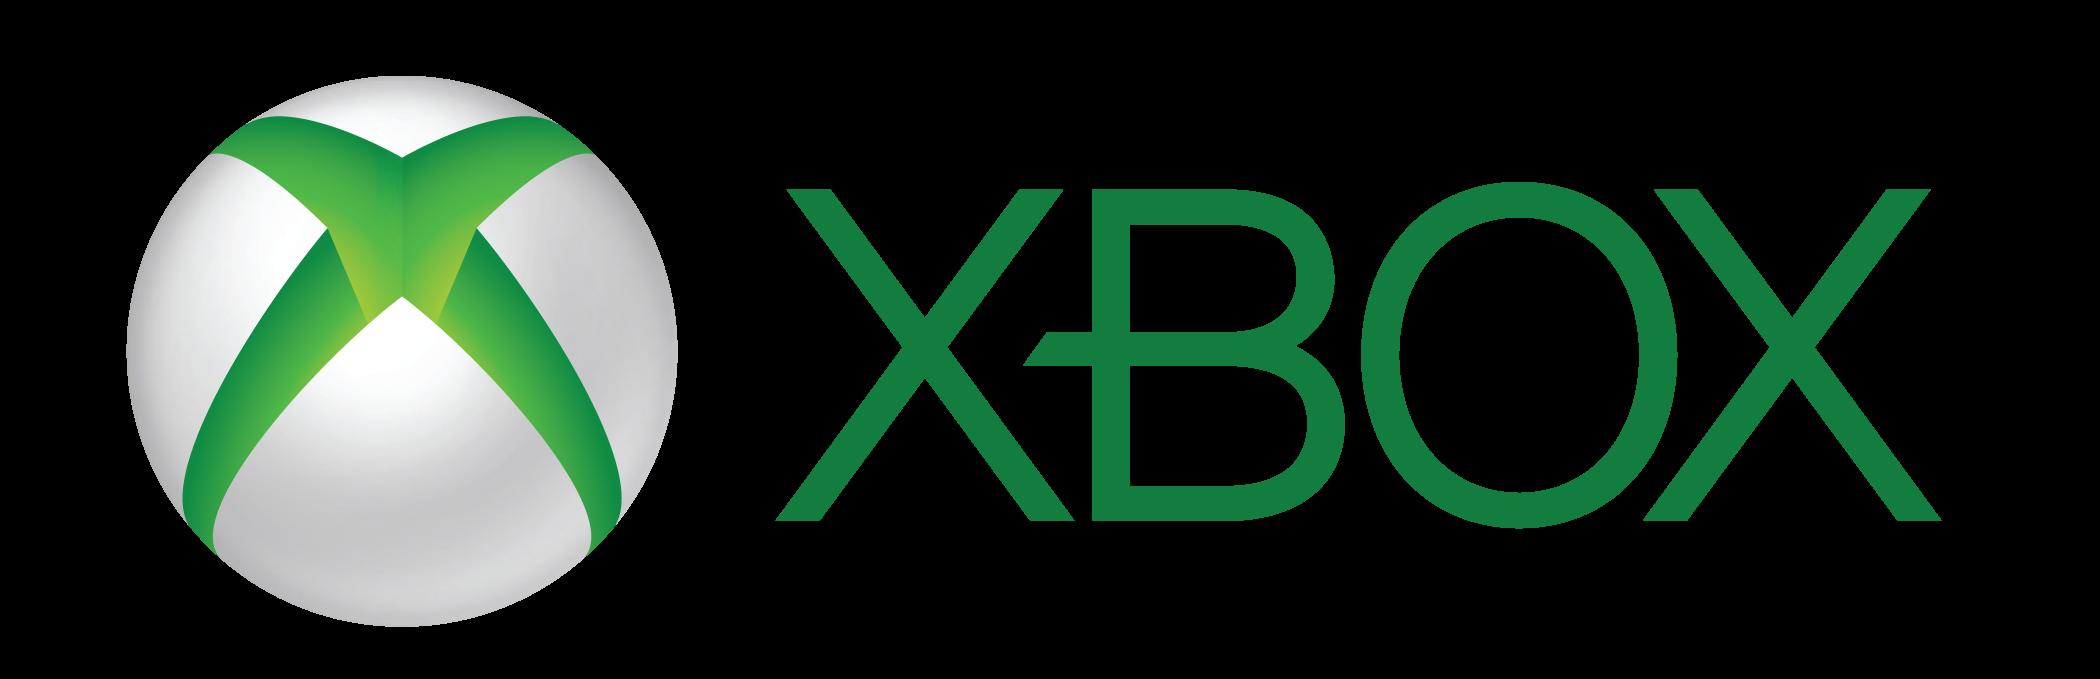 xbox-logo-1